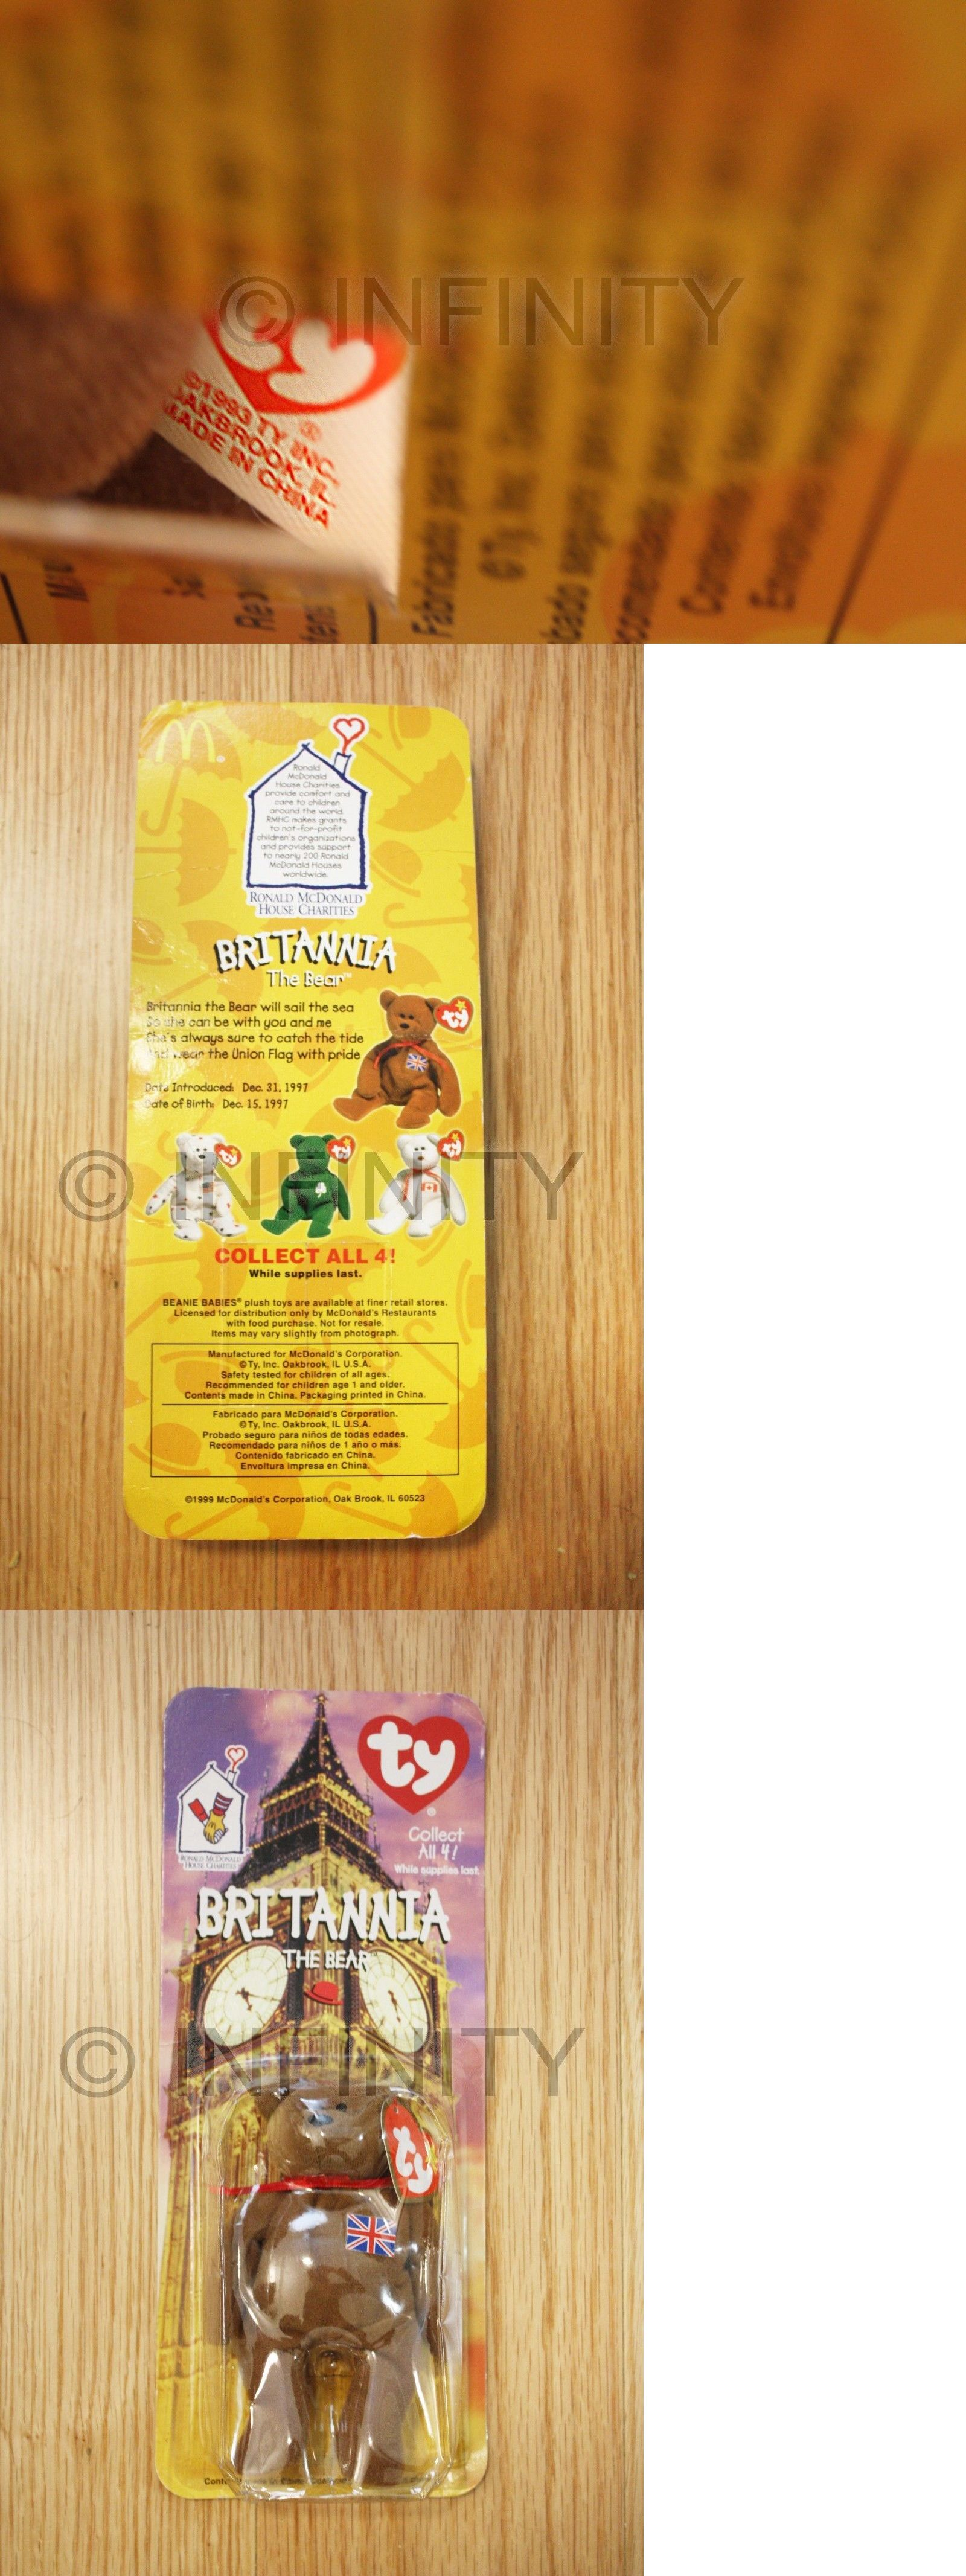 0d7c46bb4dd Beanbag Plush 49019  Rare Retired Beanie Baby 1999 Release Of Teenie Beanie   Multiple Errors  -  BUY IT NOW ONLY   10000 on eBay!